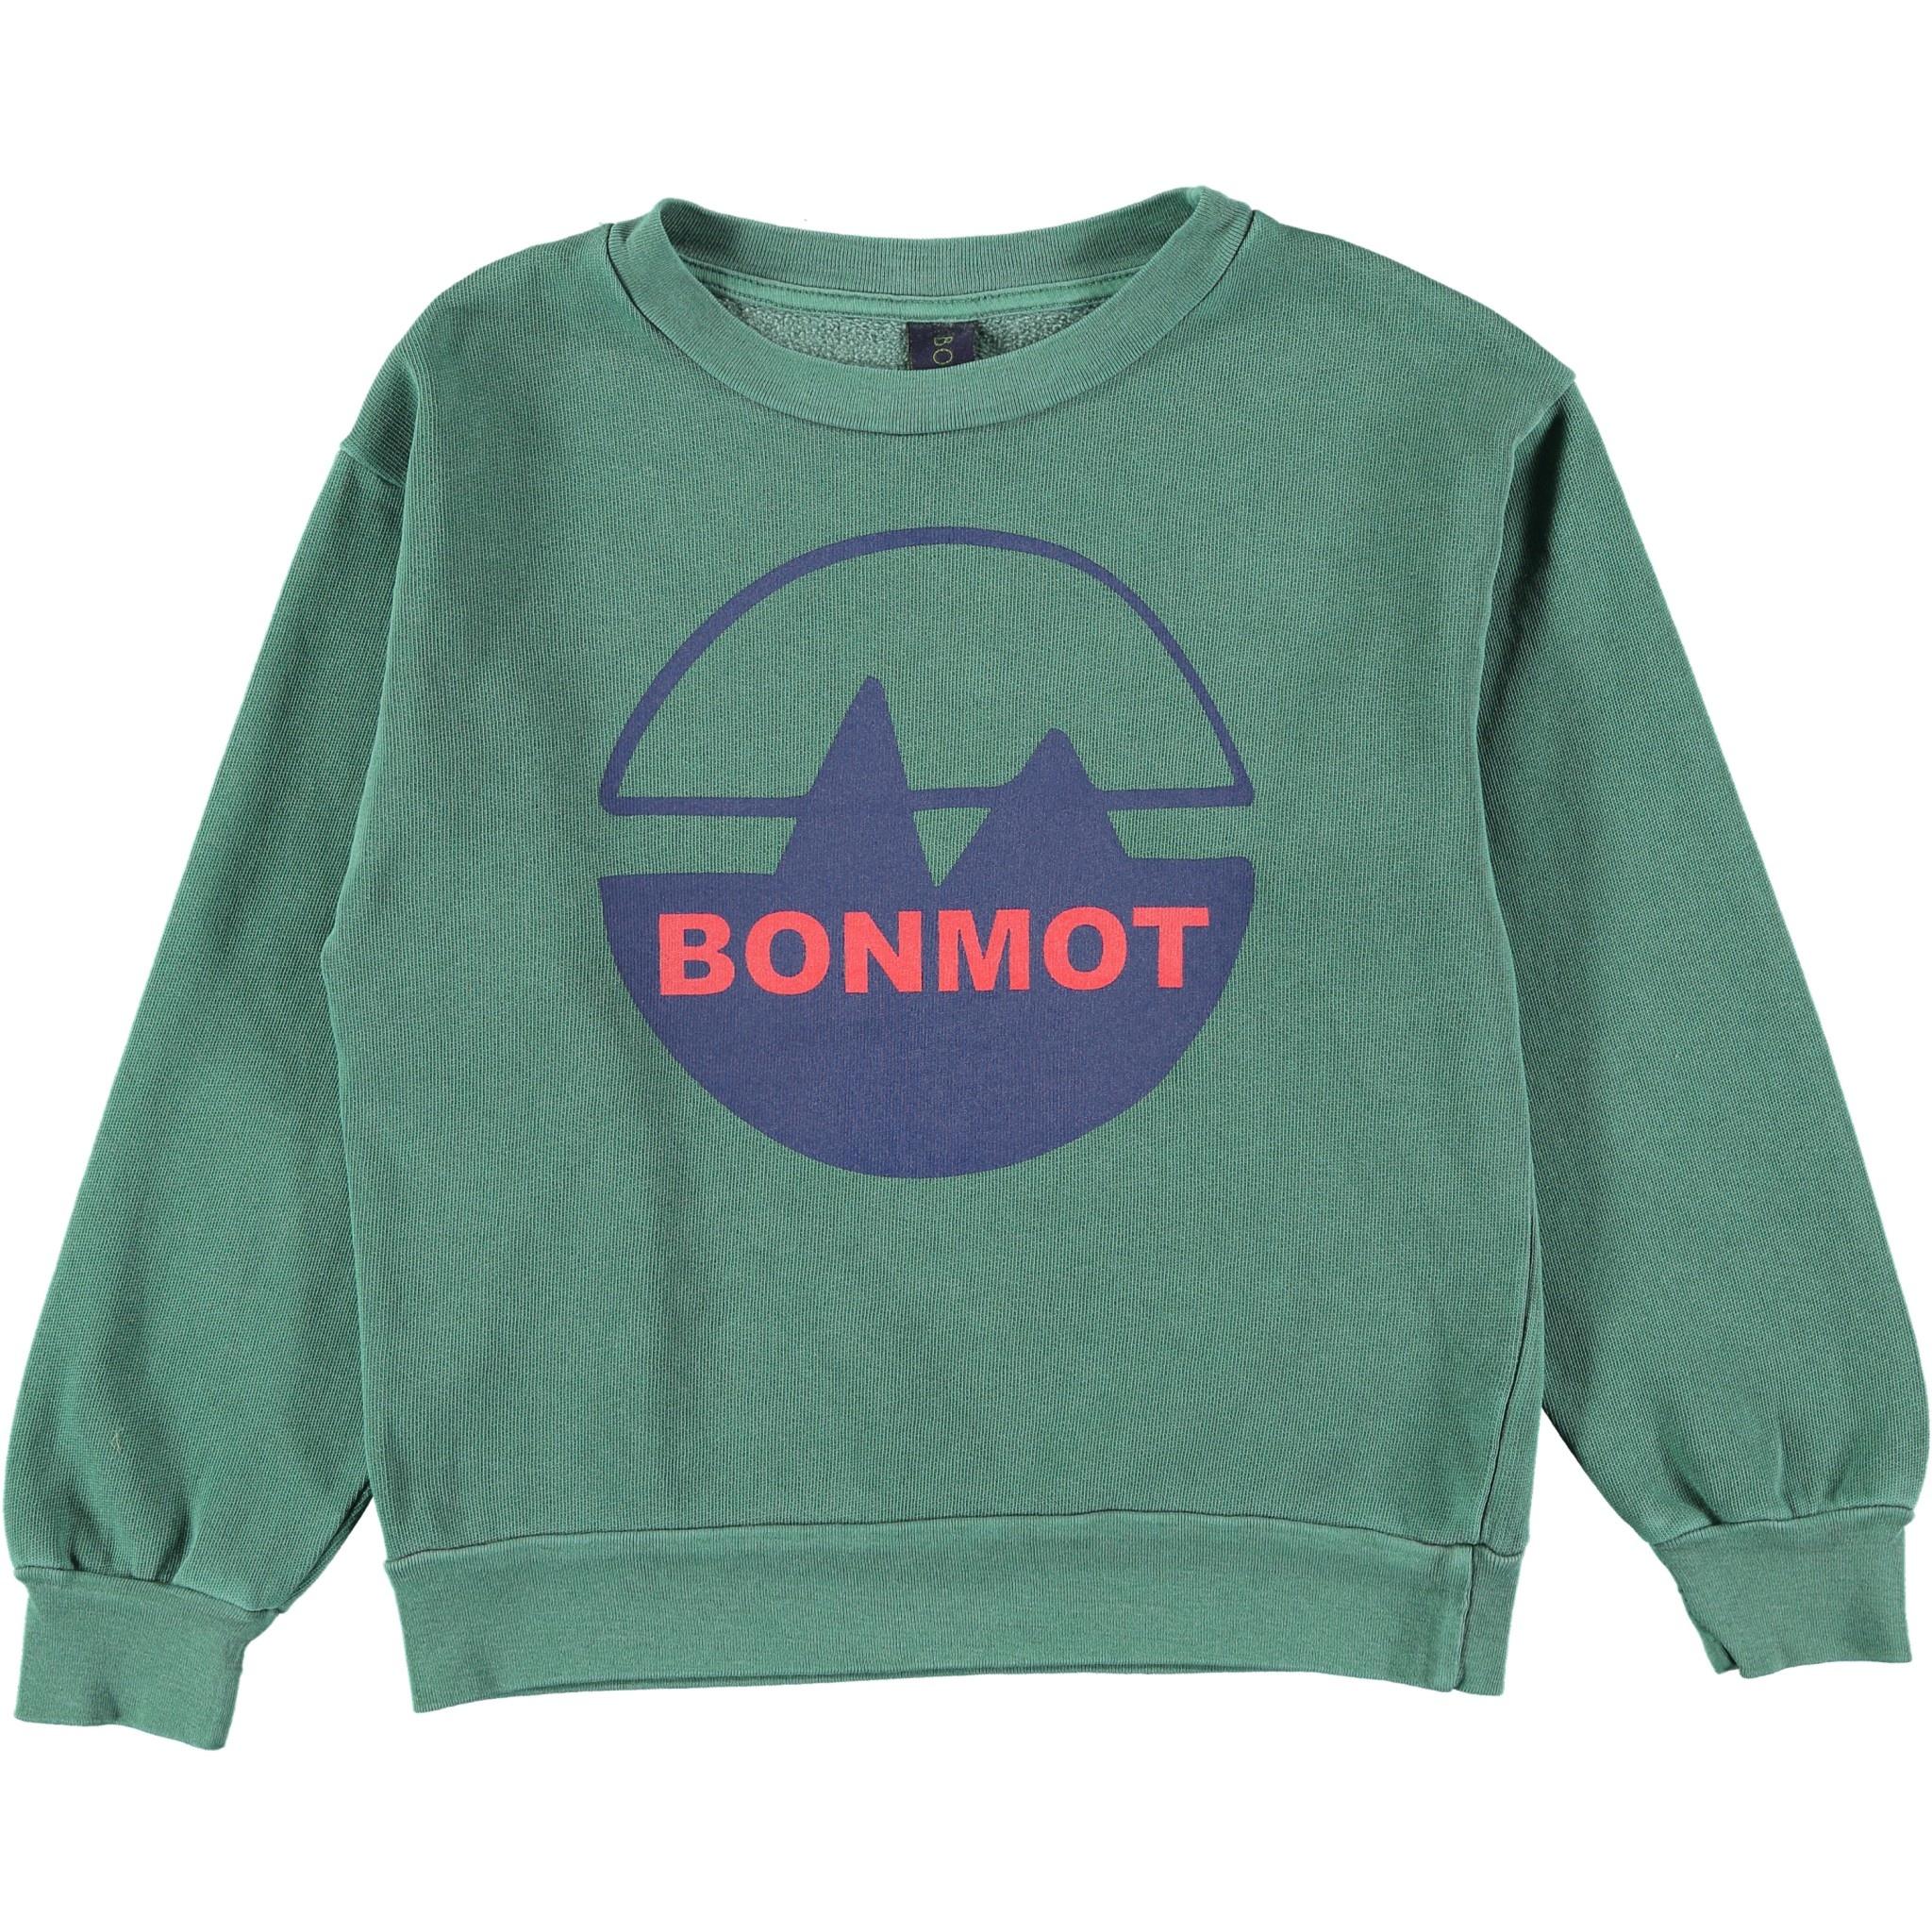 Sweatshirt bonmot mountain greenlake-1